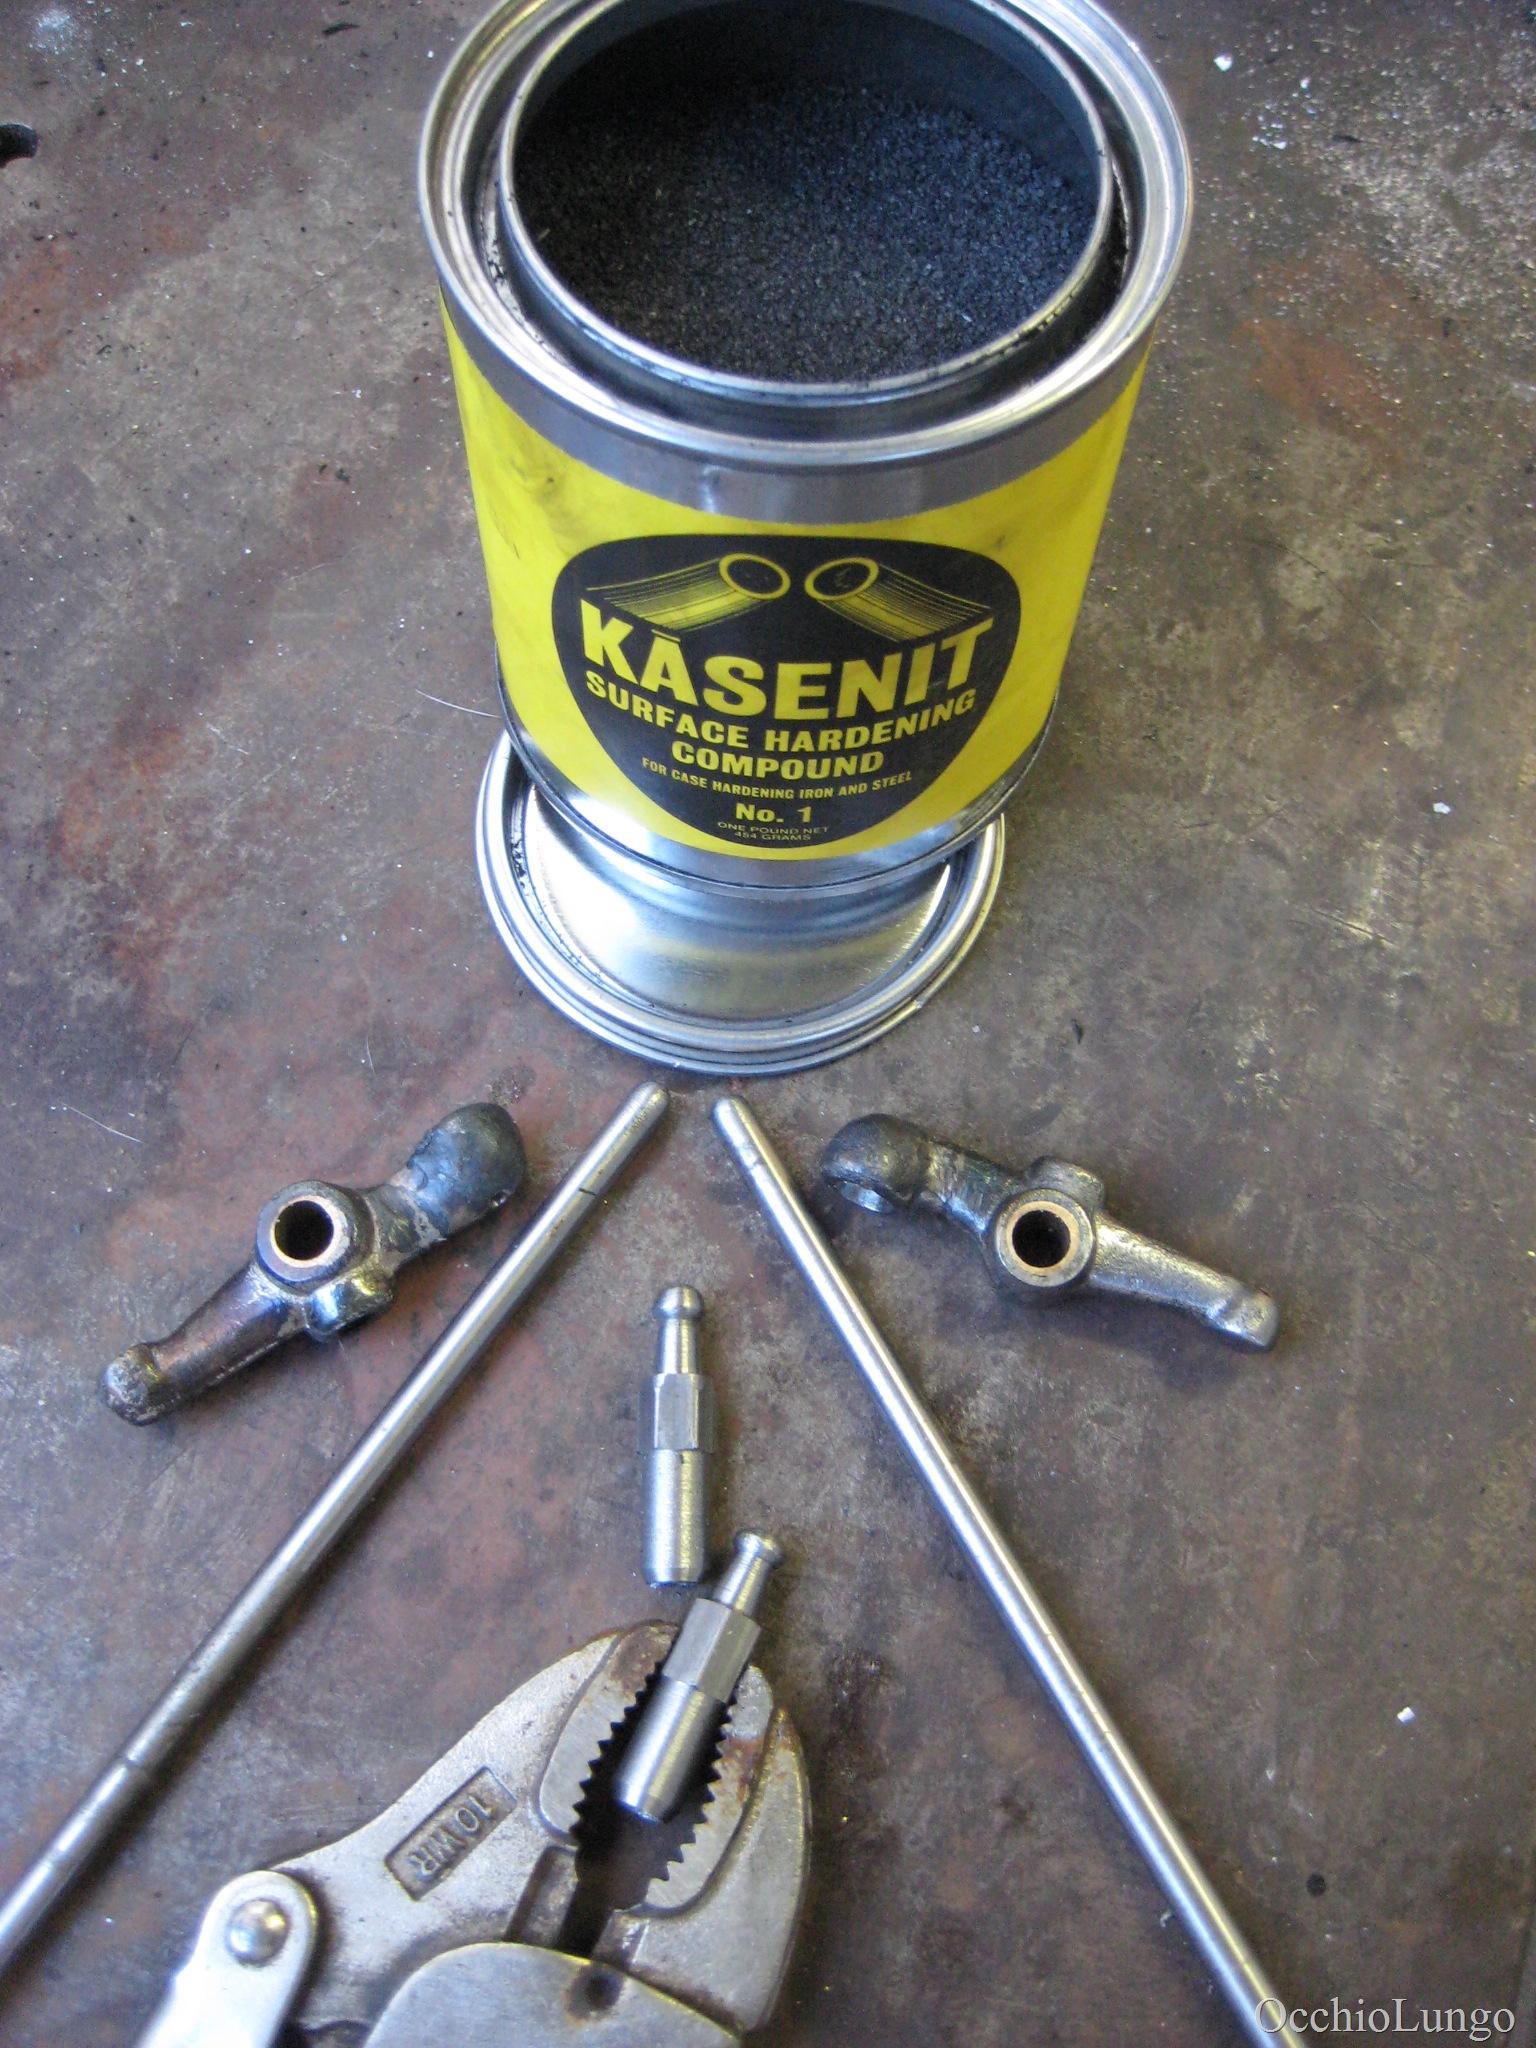 Case hardening compound powder Kasenit